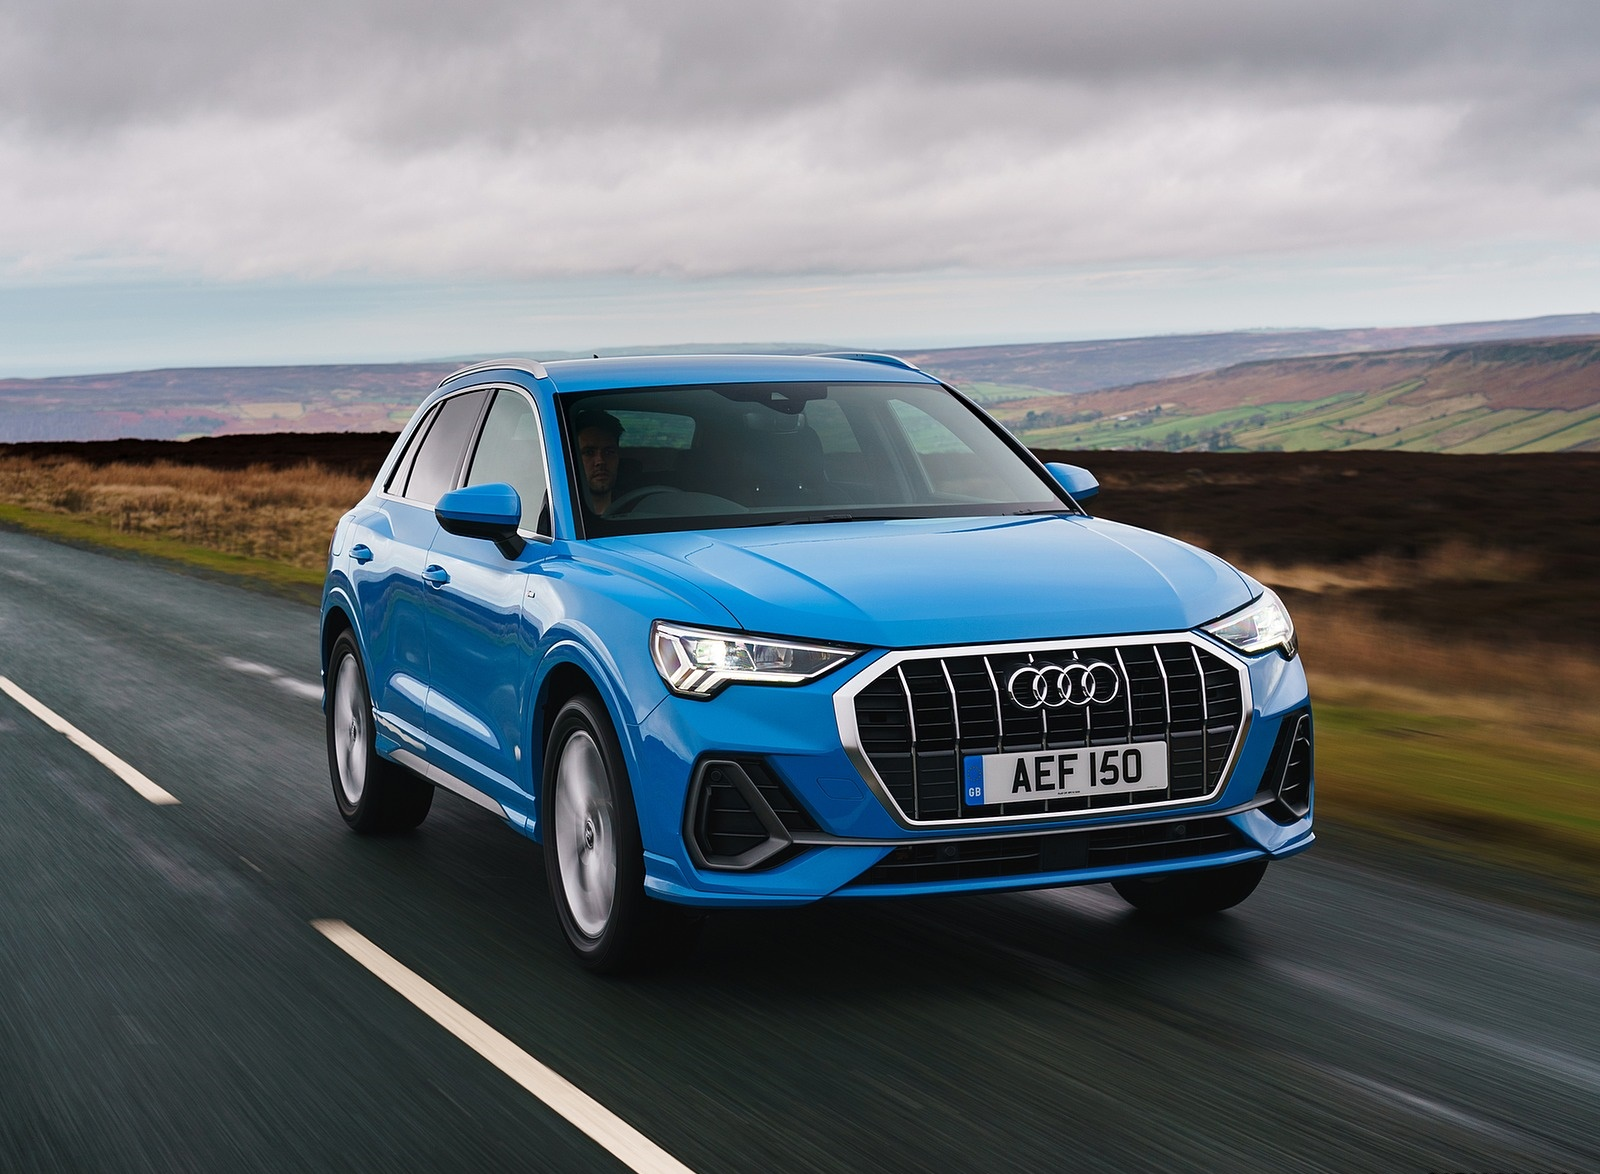 2019 Audi Q3 35 TFSI (UK-Spec) Front Wallpaper (11)